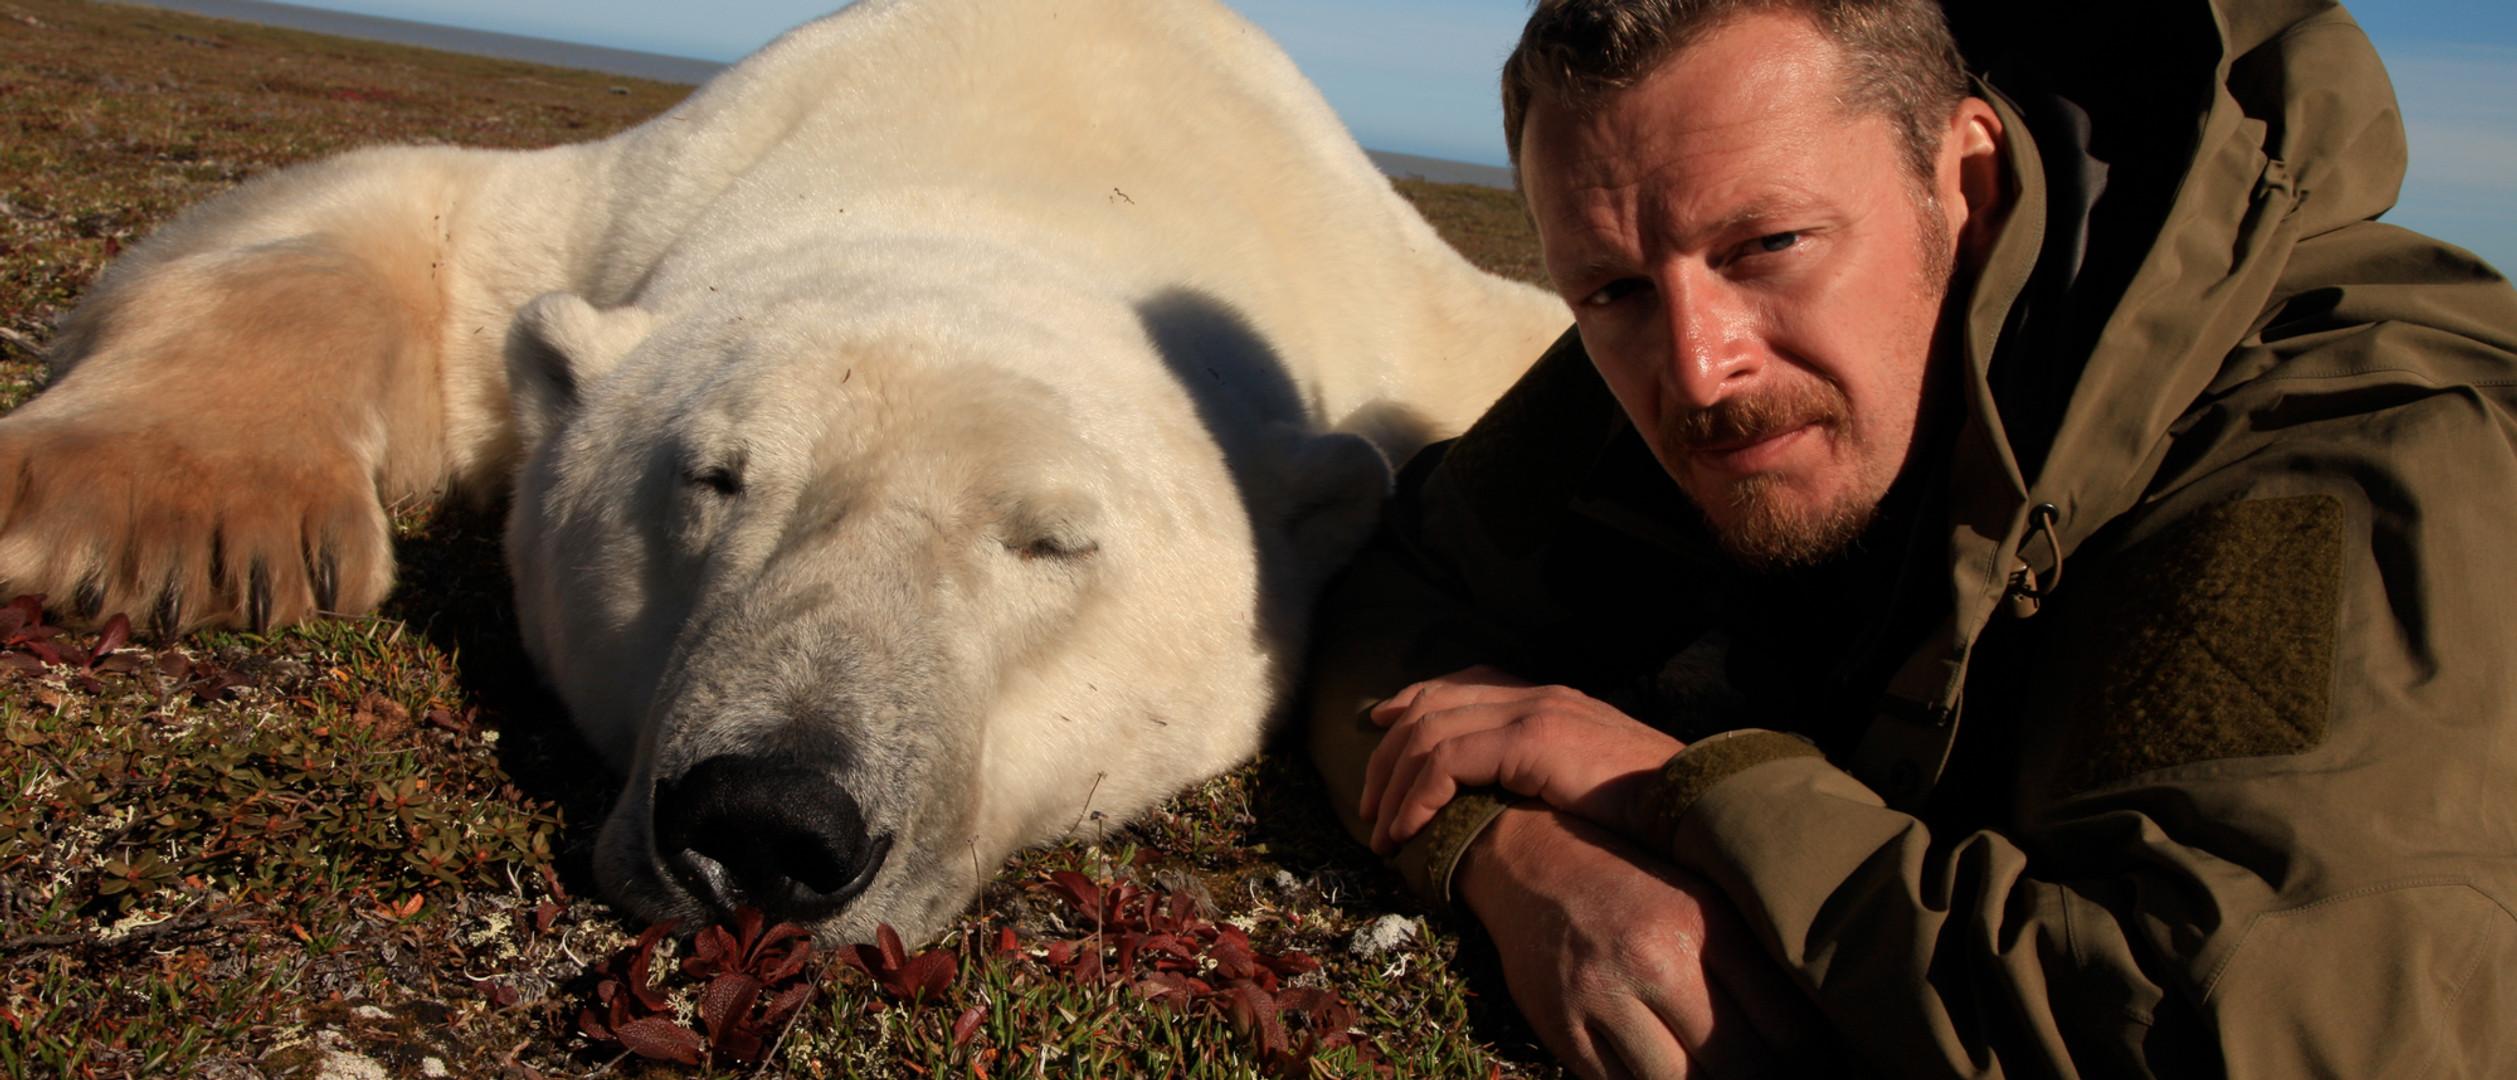 # tranquilized polar bear by dean cannon